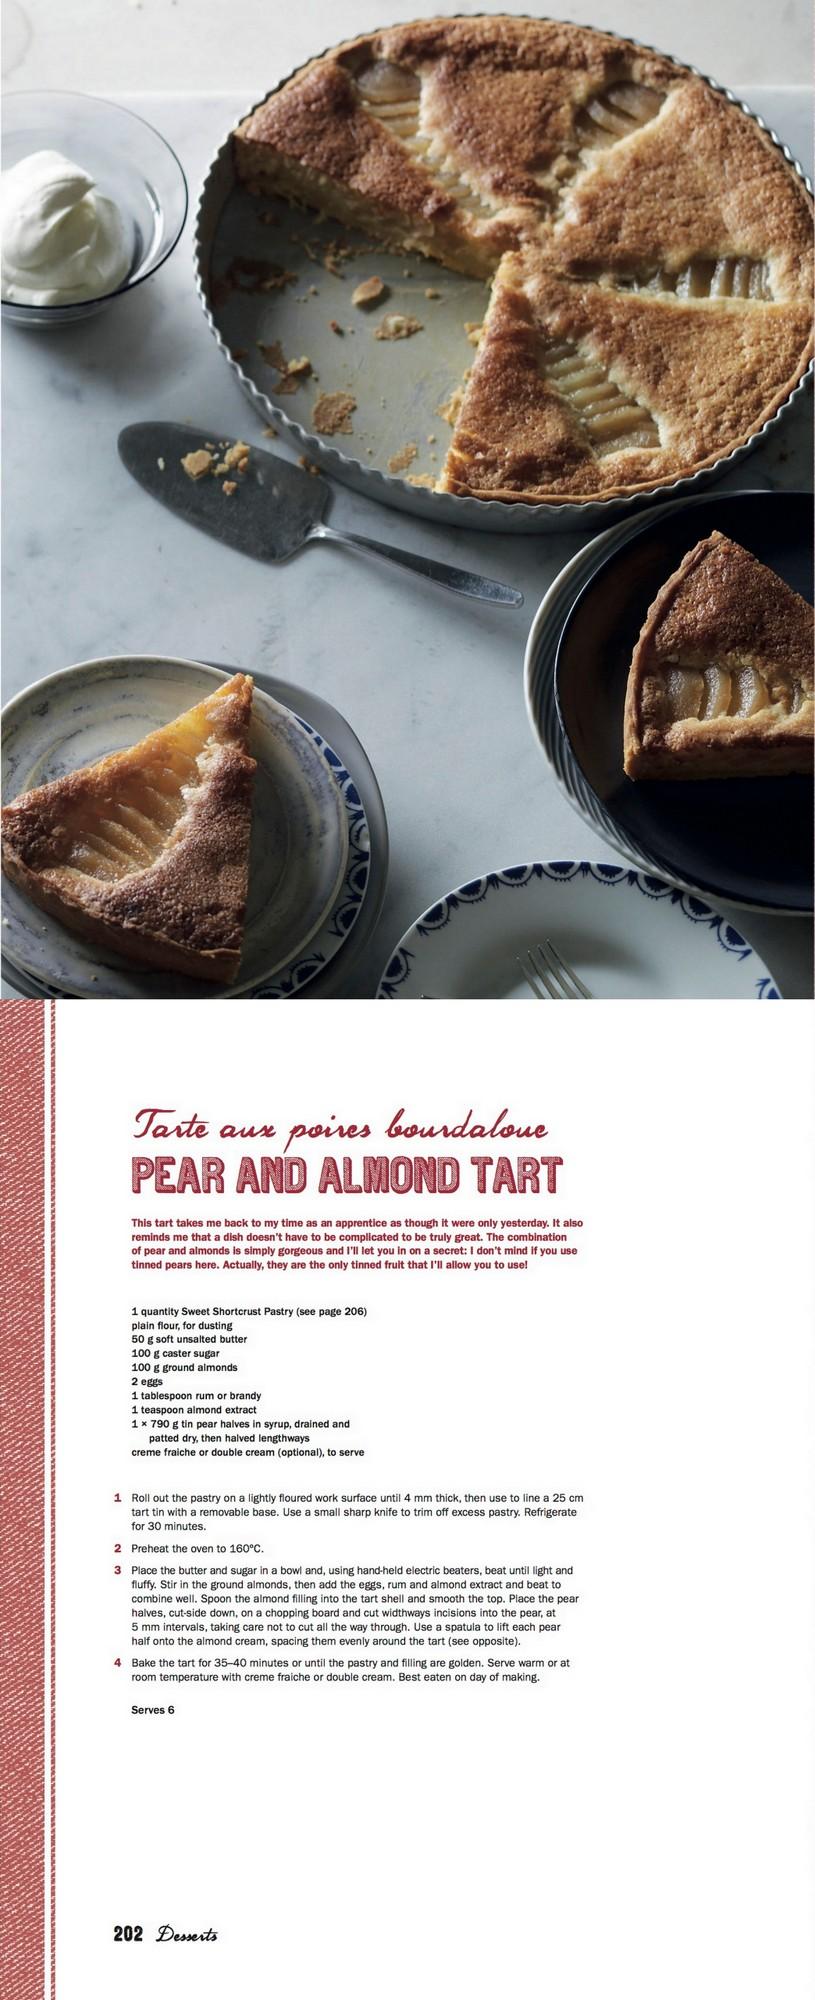 Manu's French Kitchen - Pear Tart